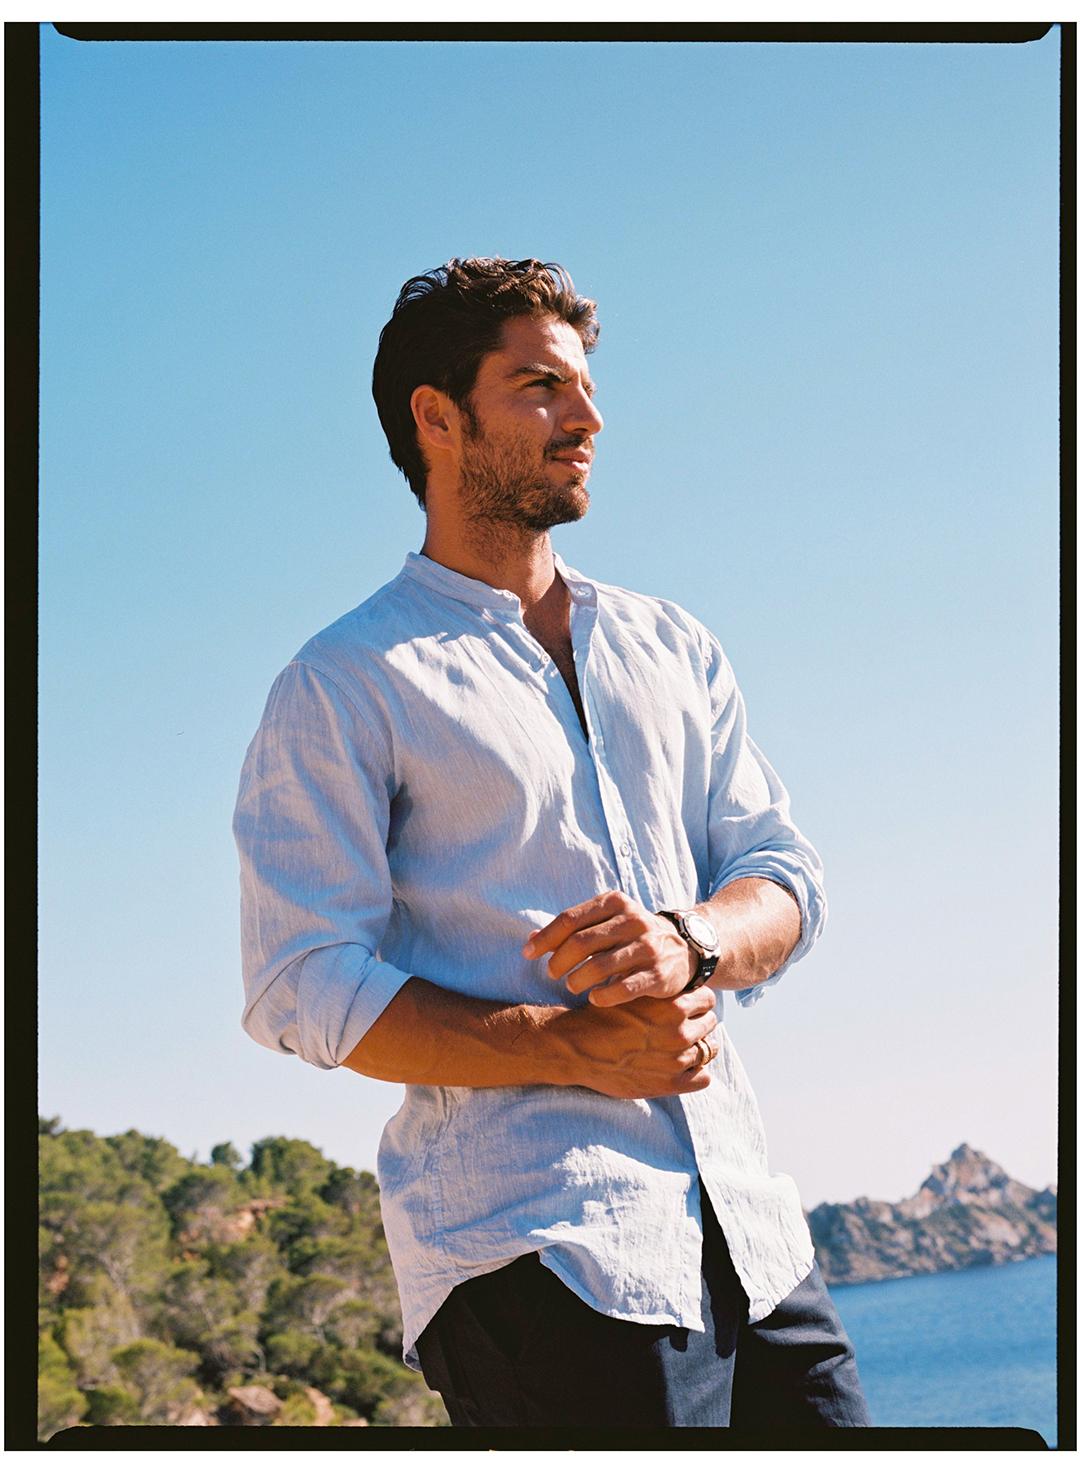 Maxi Iglesias - Condé Nast Traveler - Ibiza - Beatriz Janer - 8AM - 8 Artist Management